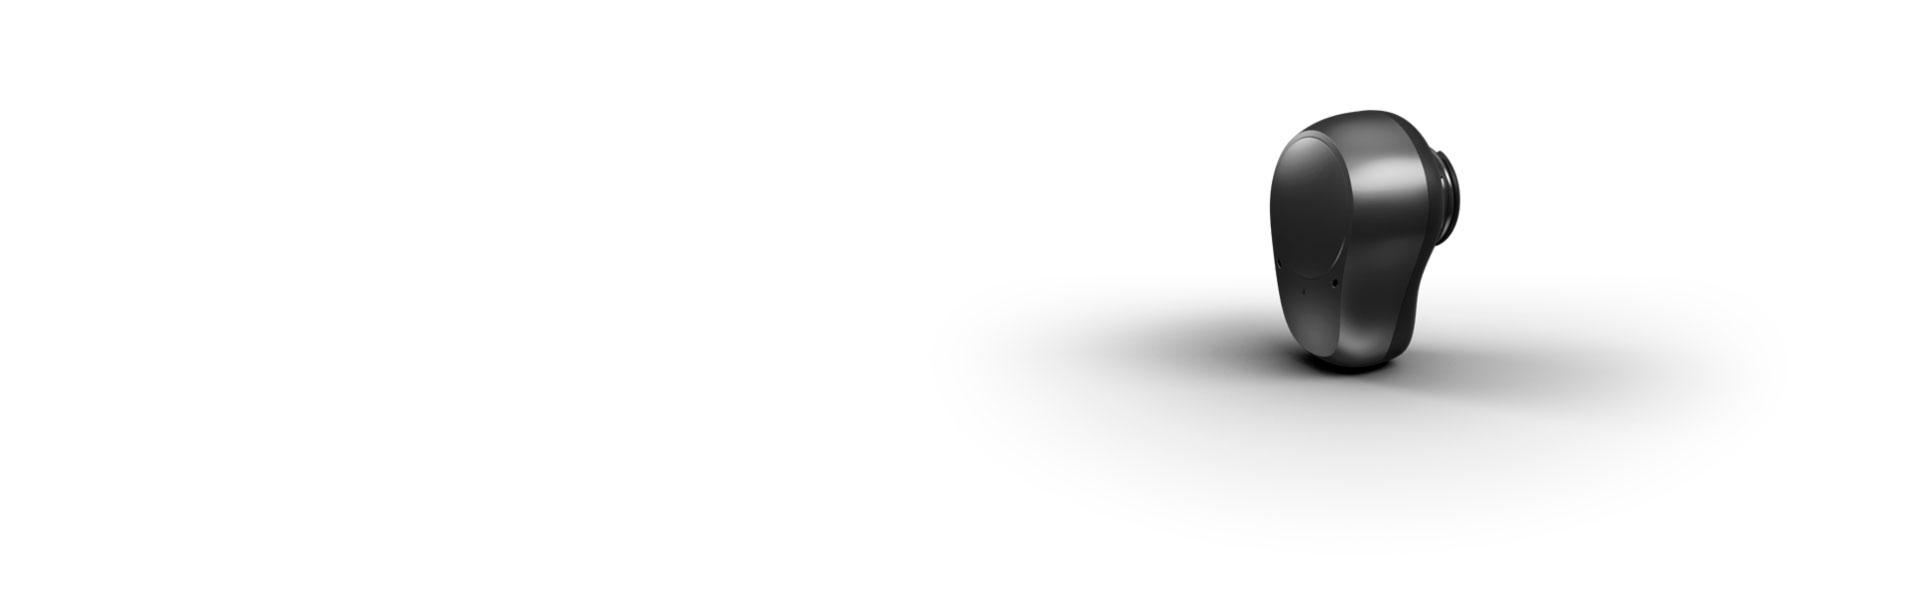 1920x600-ponto5-mini